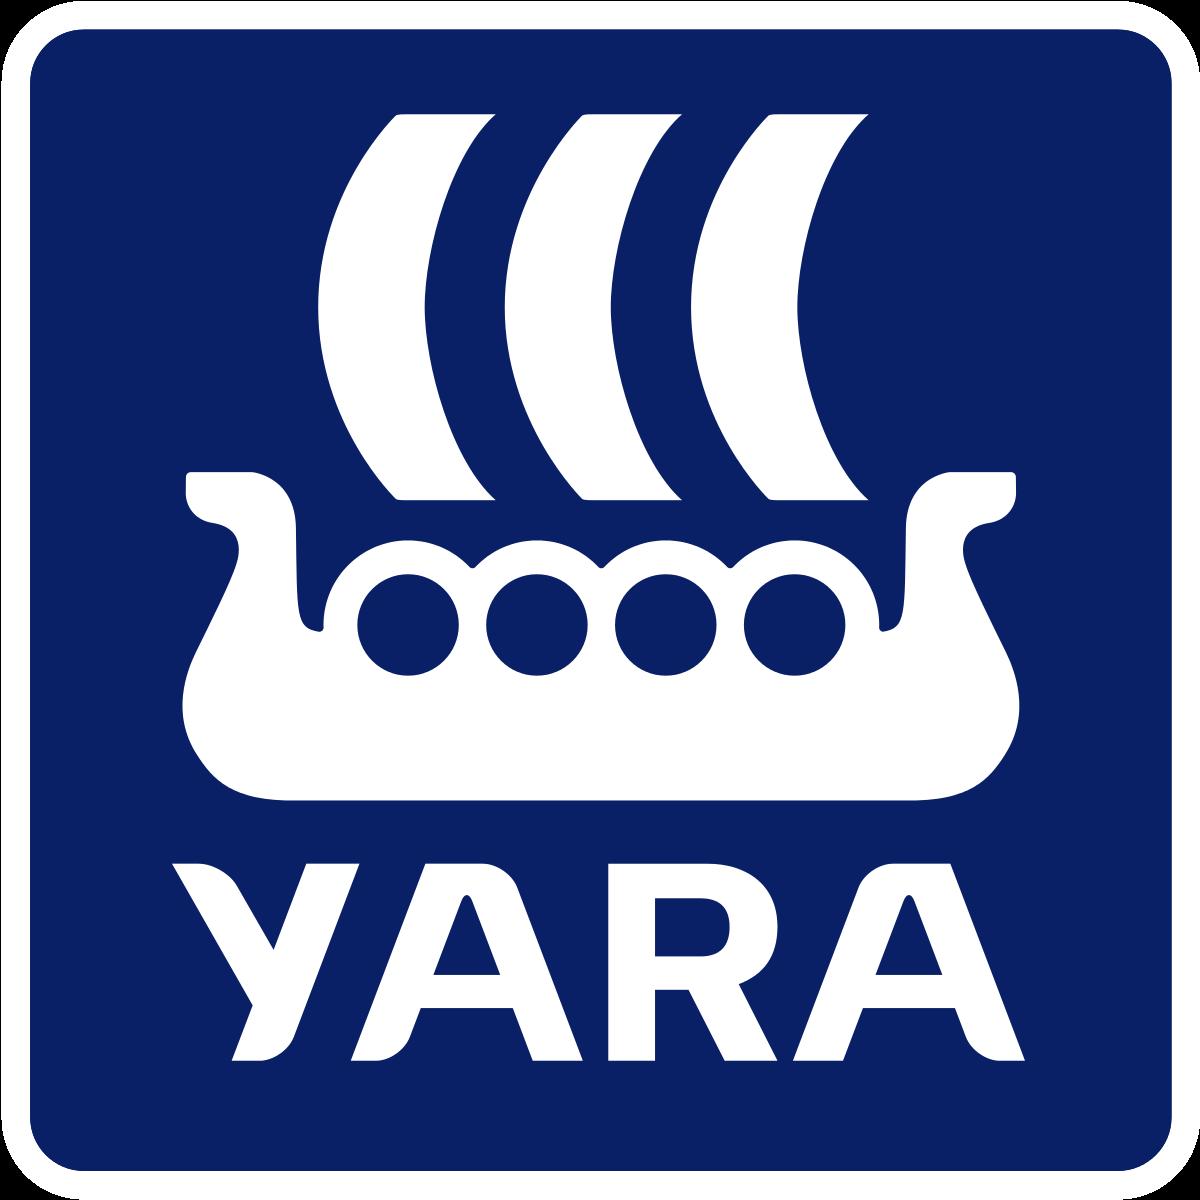 Image yayra